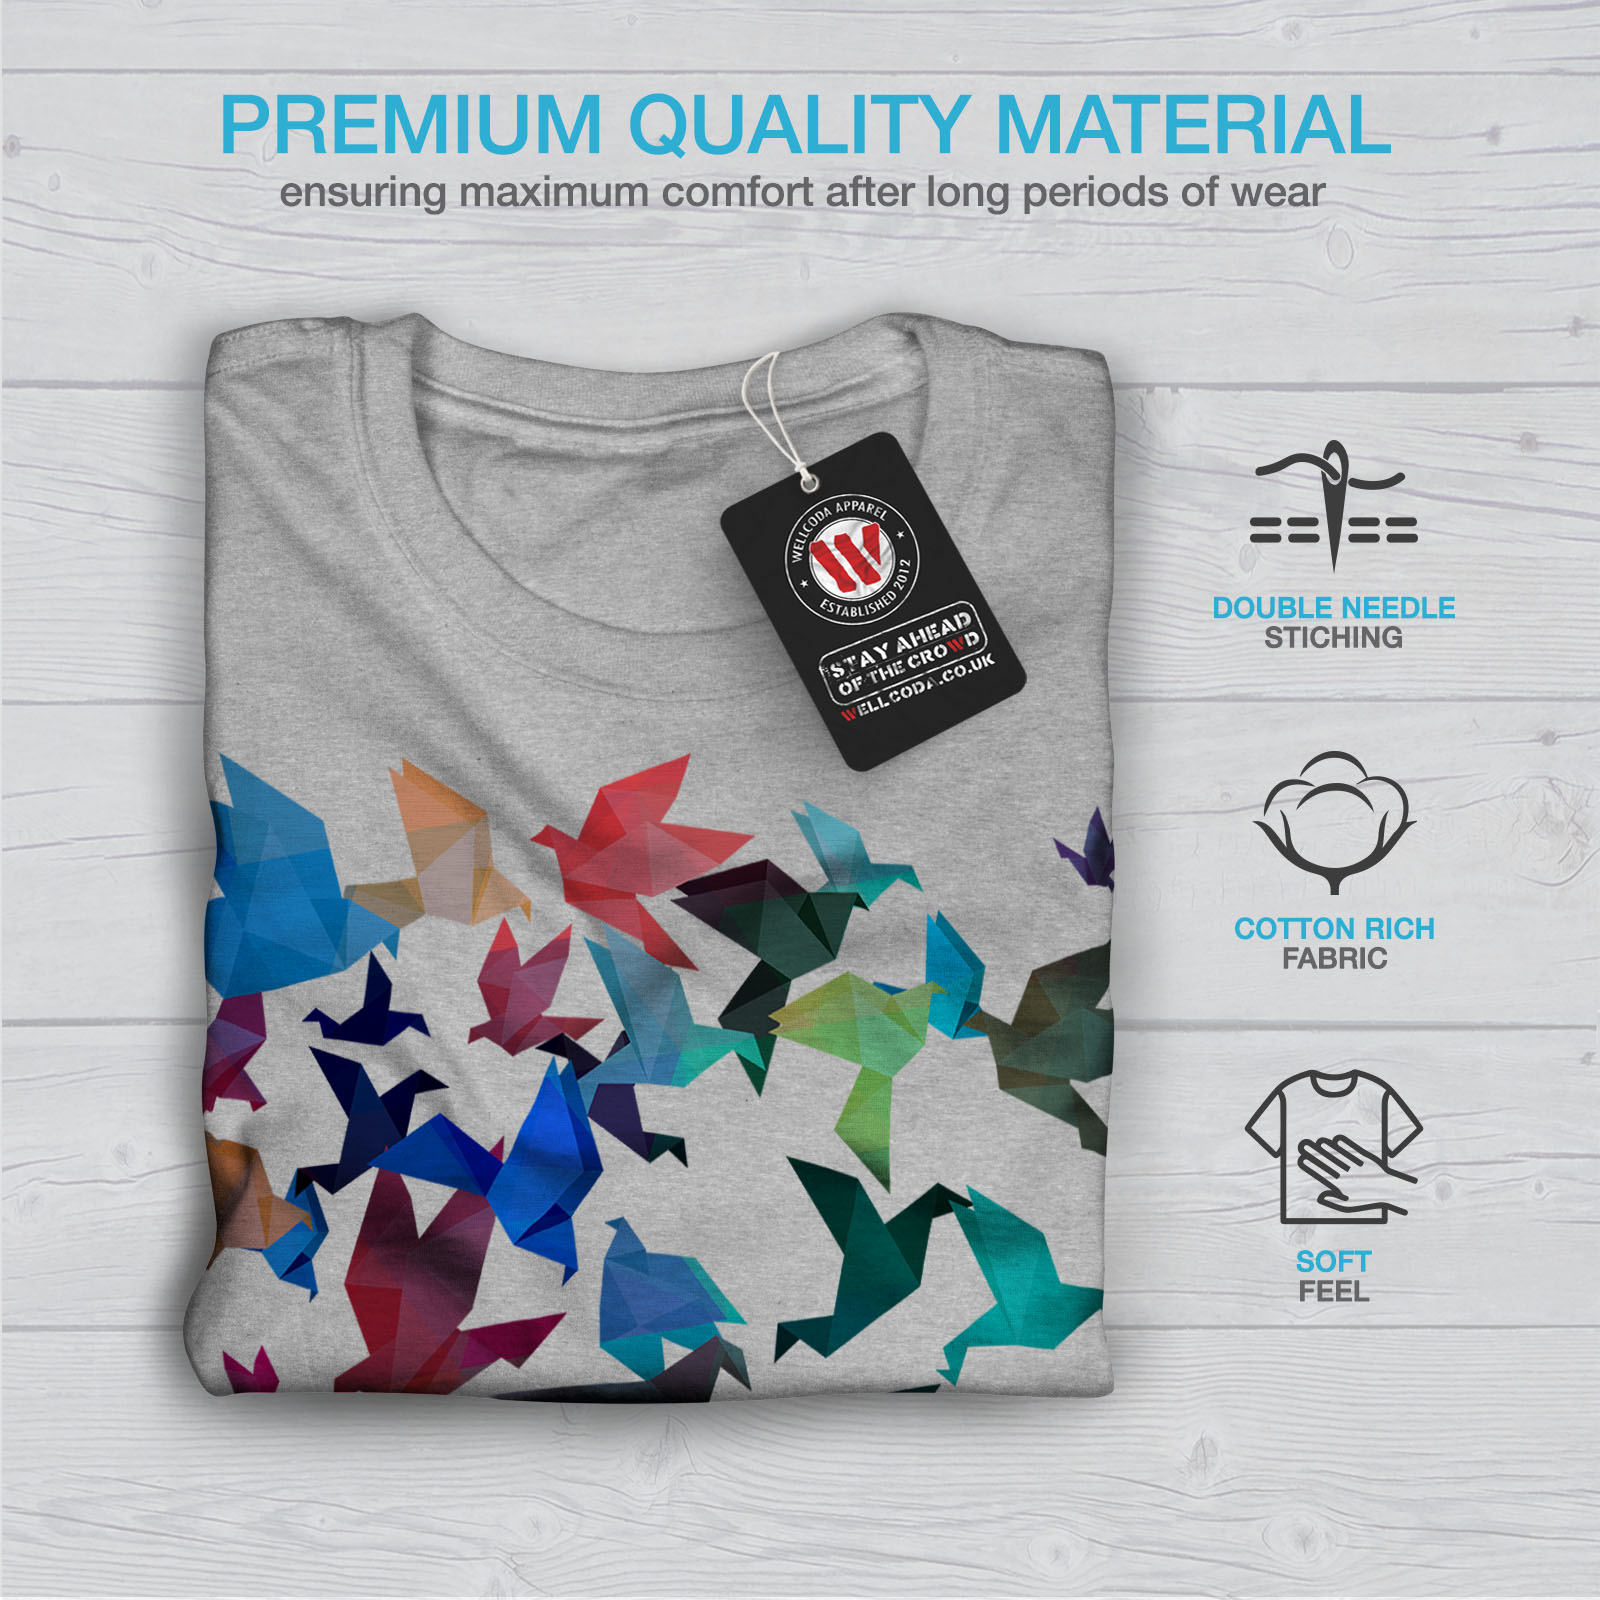 Wellcoda-Origami-Bird-Colors-Mens-T-shirt-Craft-Graphic-Design-Printed-Tee thumbnail 19